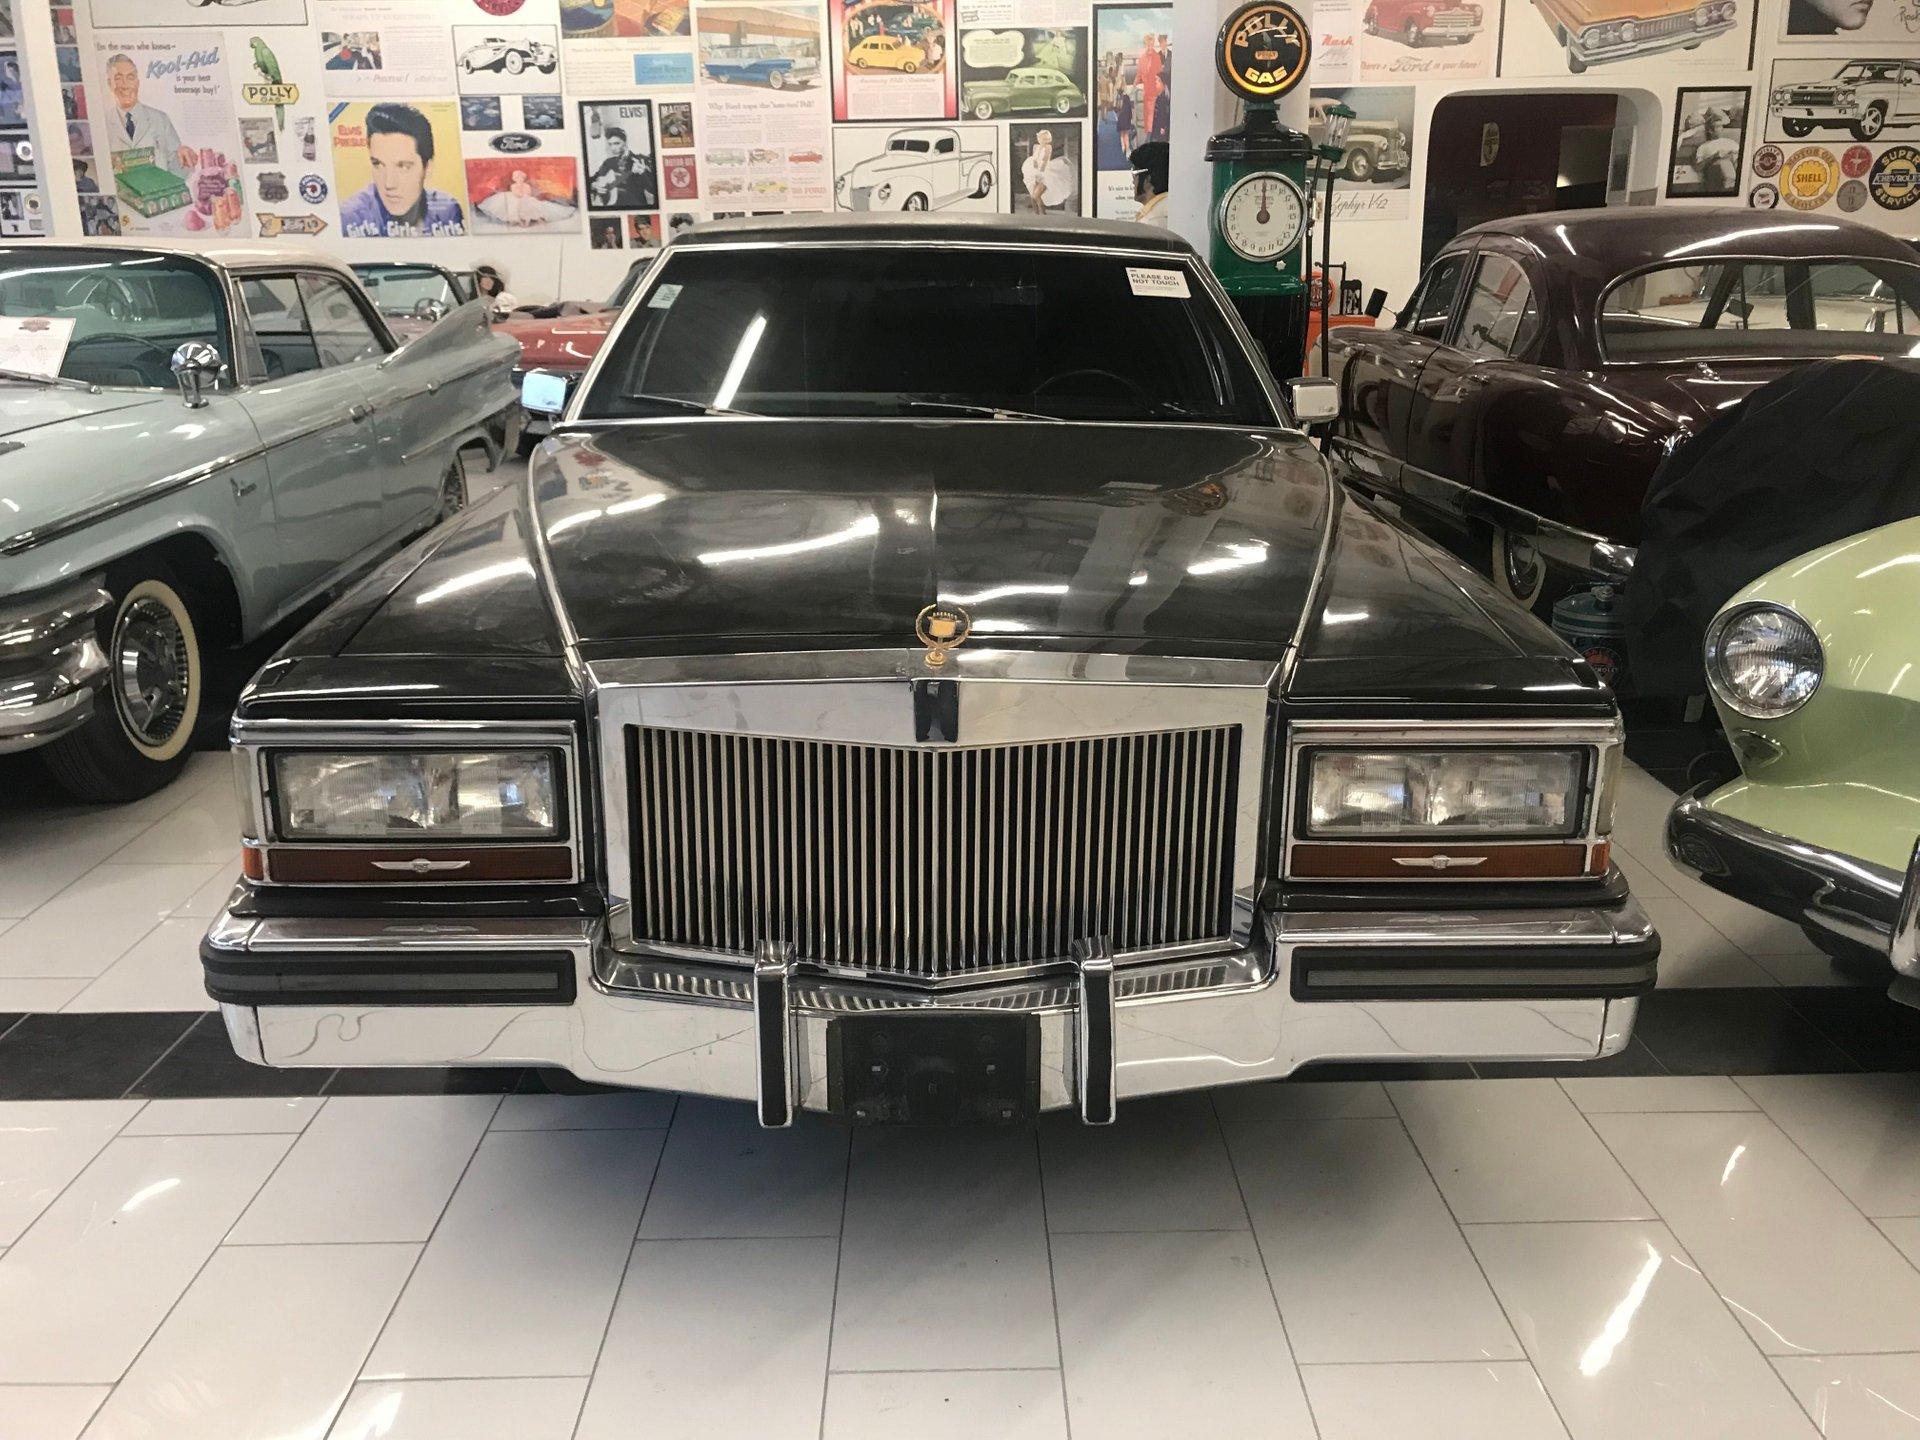 1989 cadillac trump limo